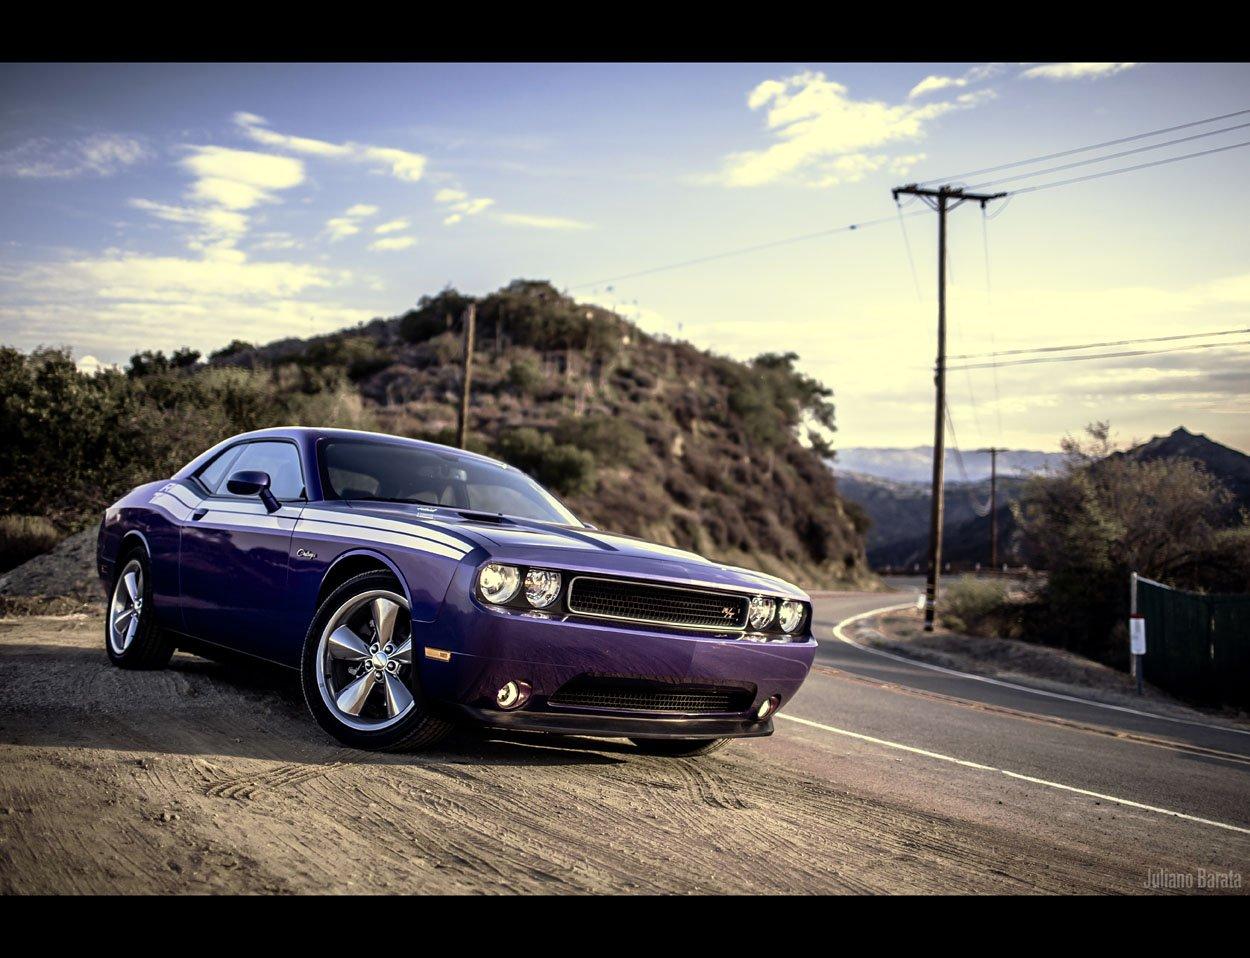 Carros E Cores As Melhores Combina 231 245 Es De Todos Os Tempos Flatout